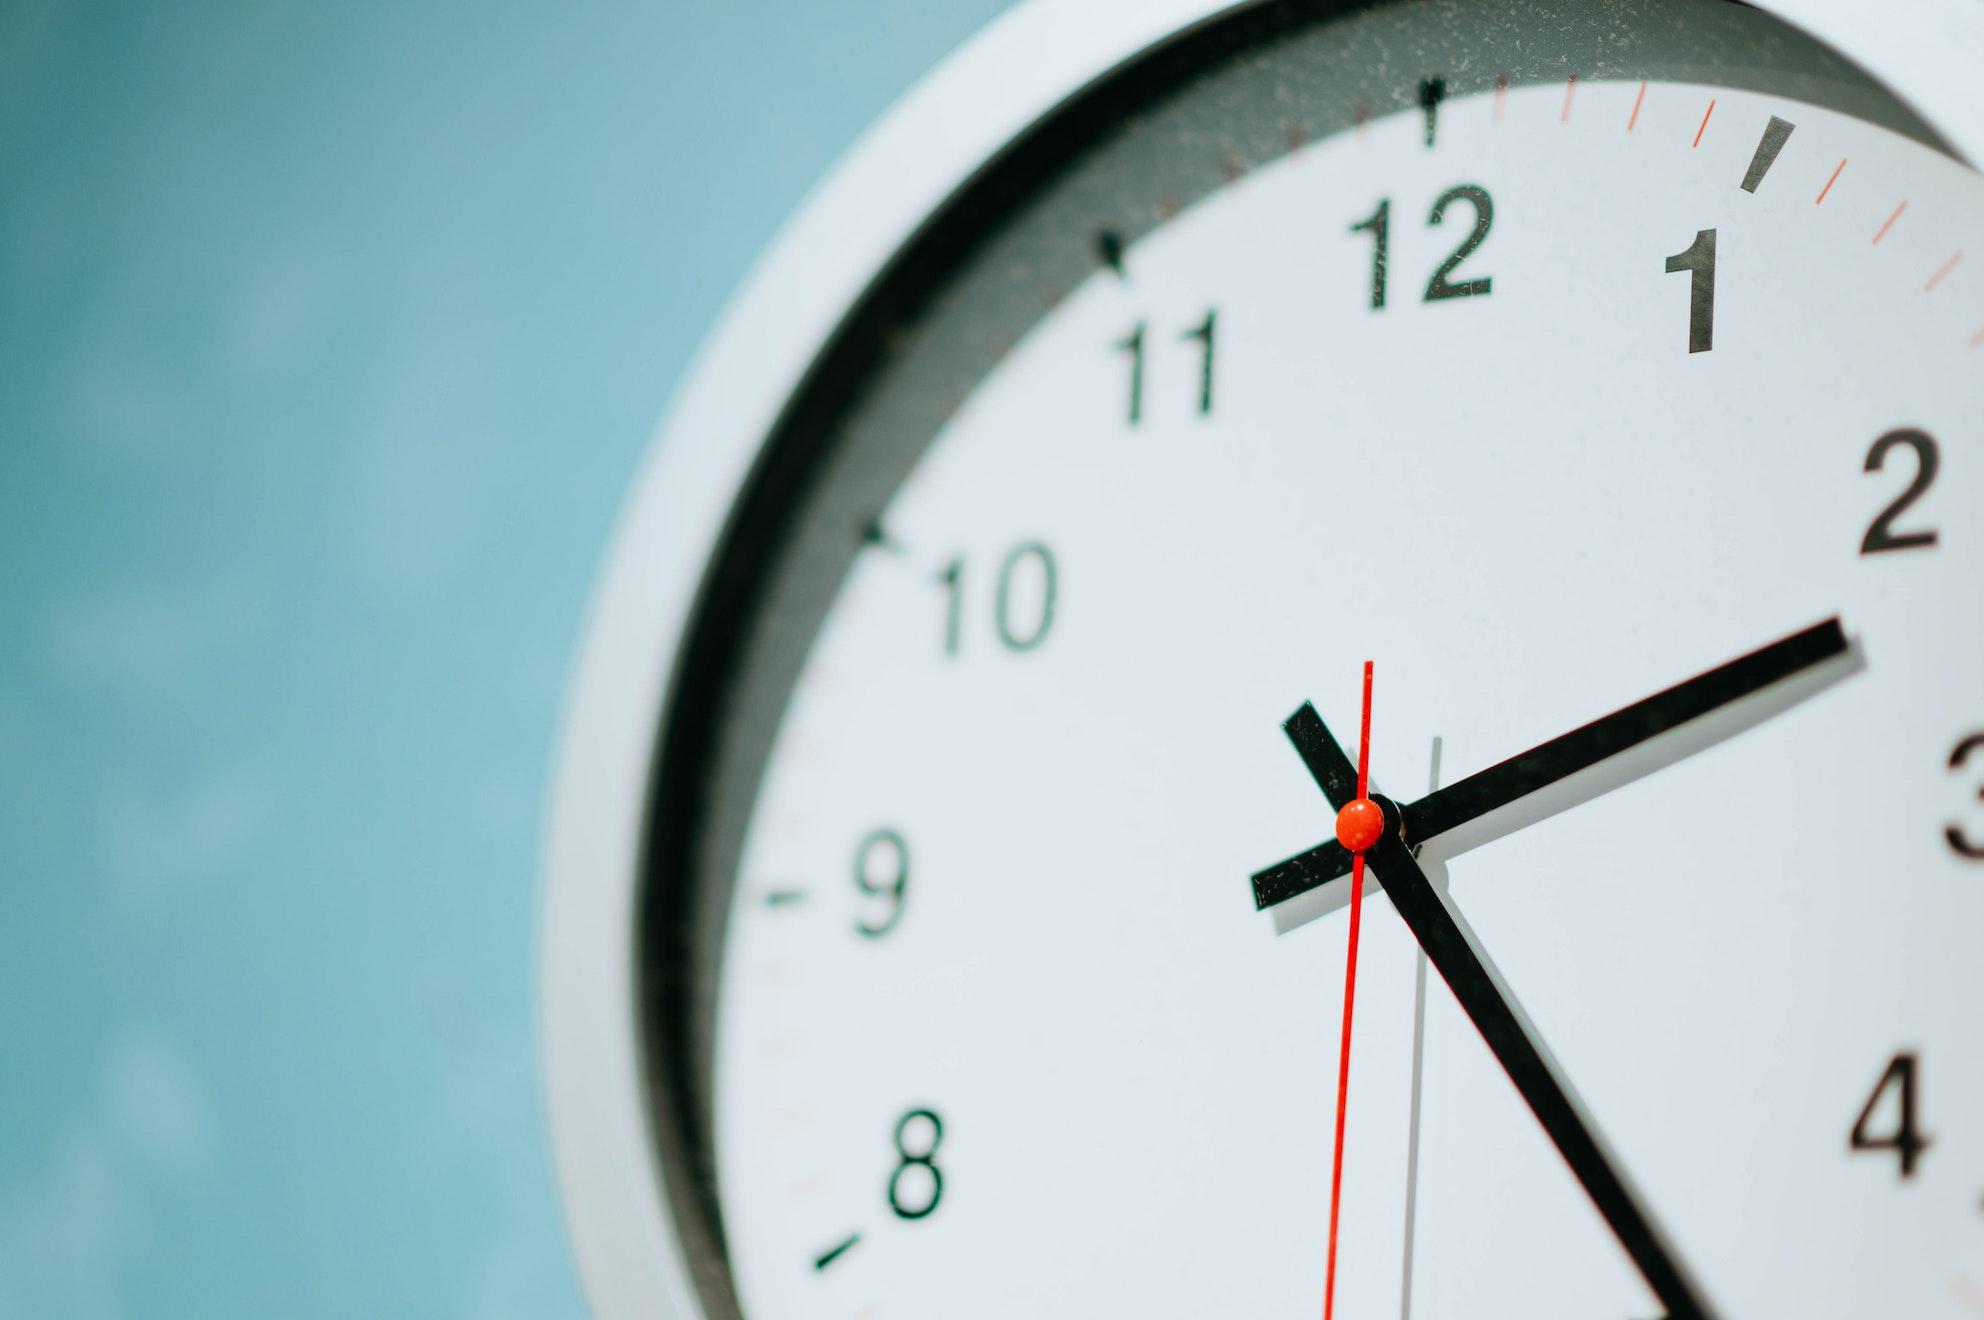 Better sleep through scheduling